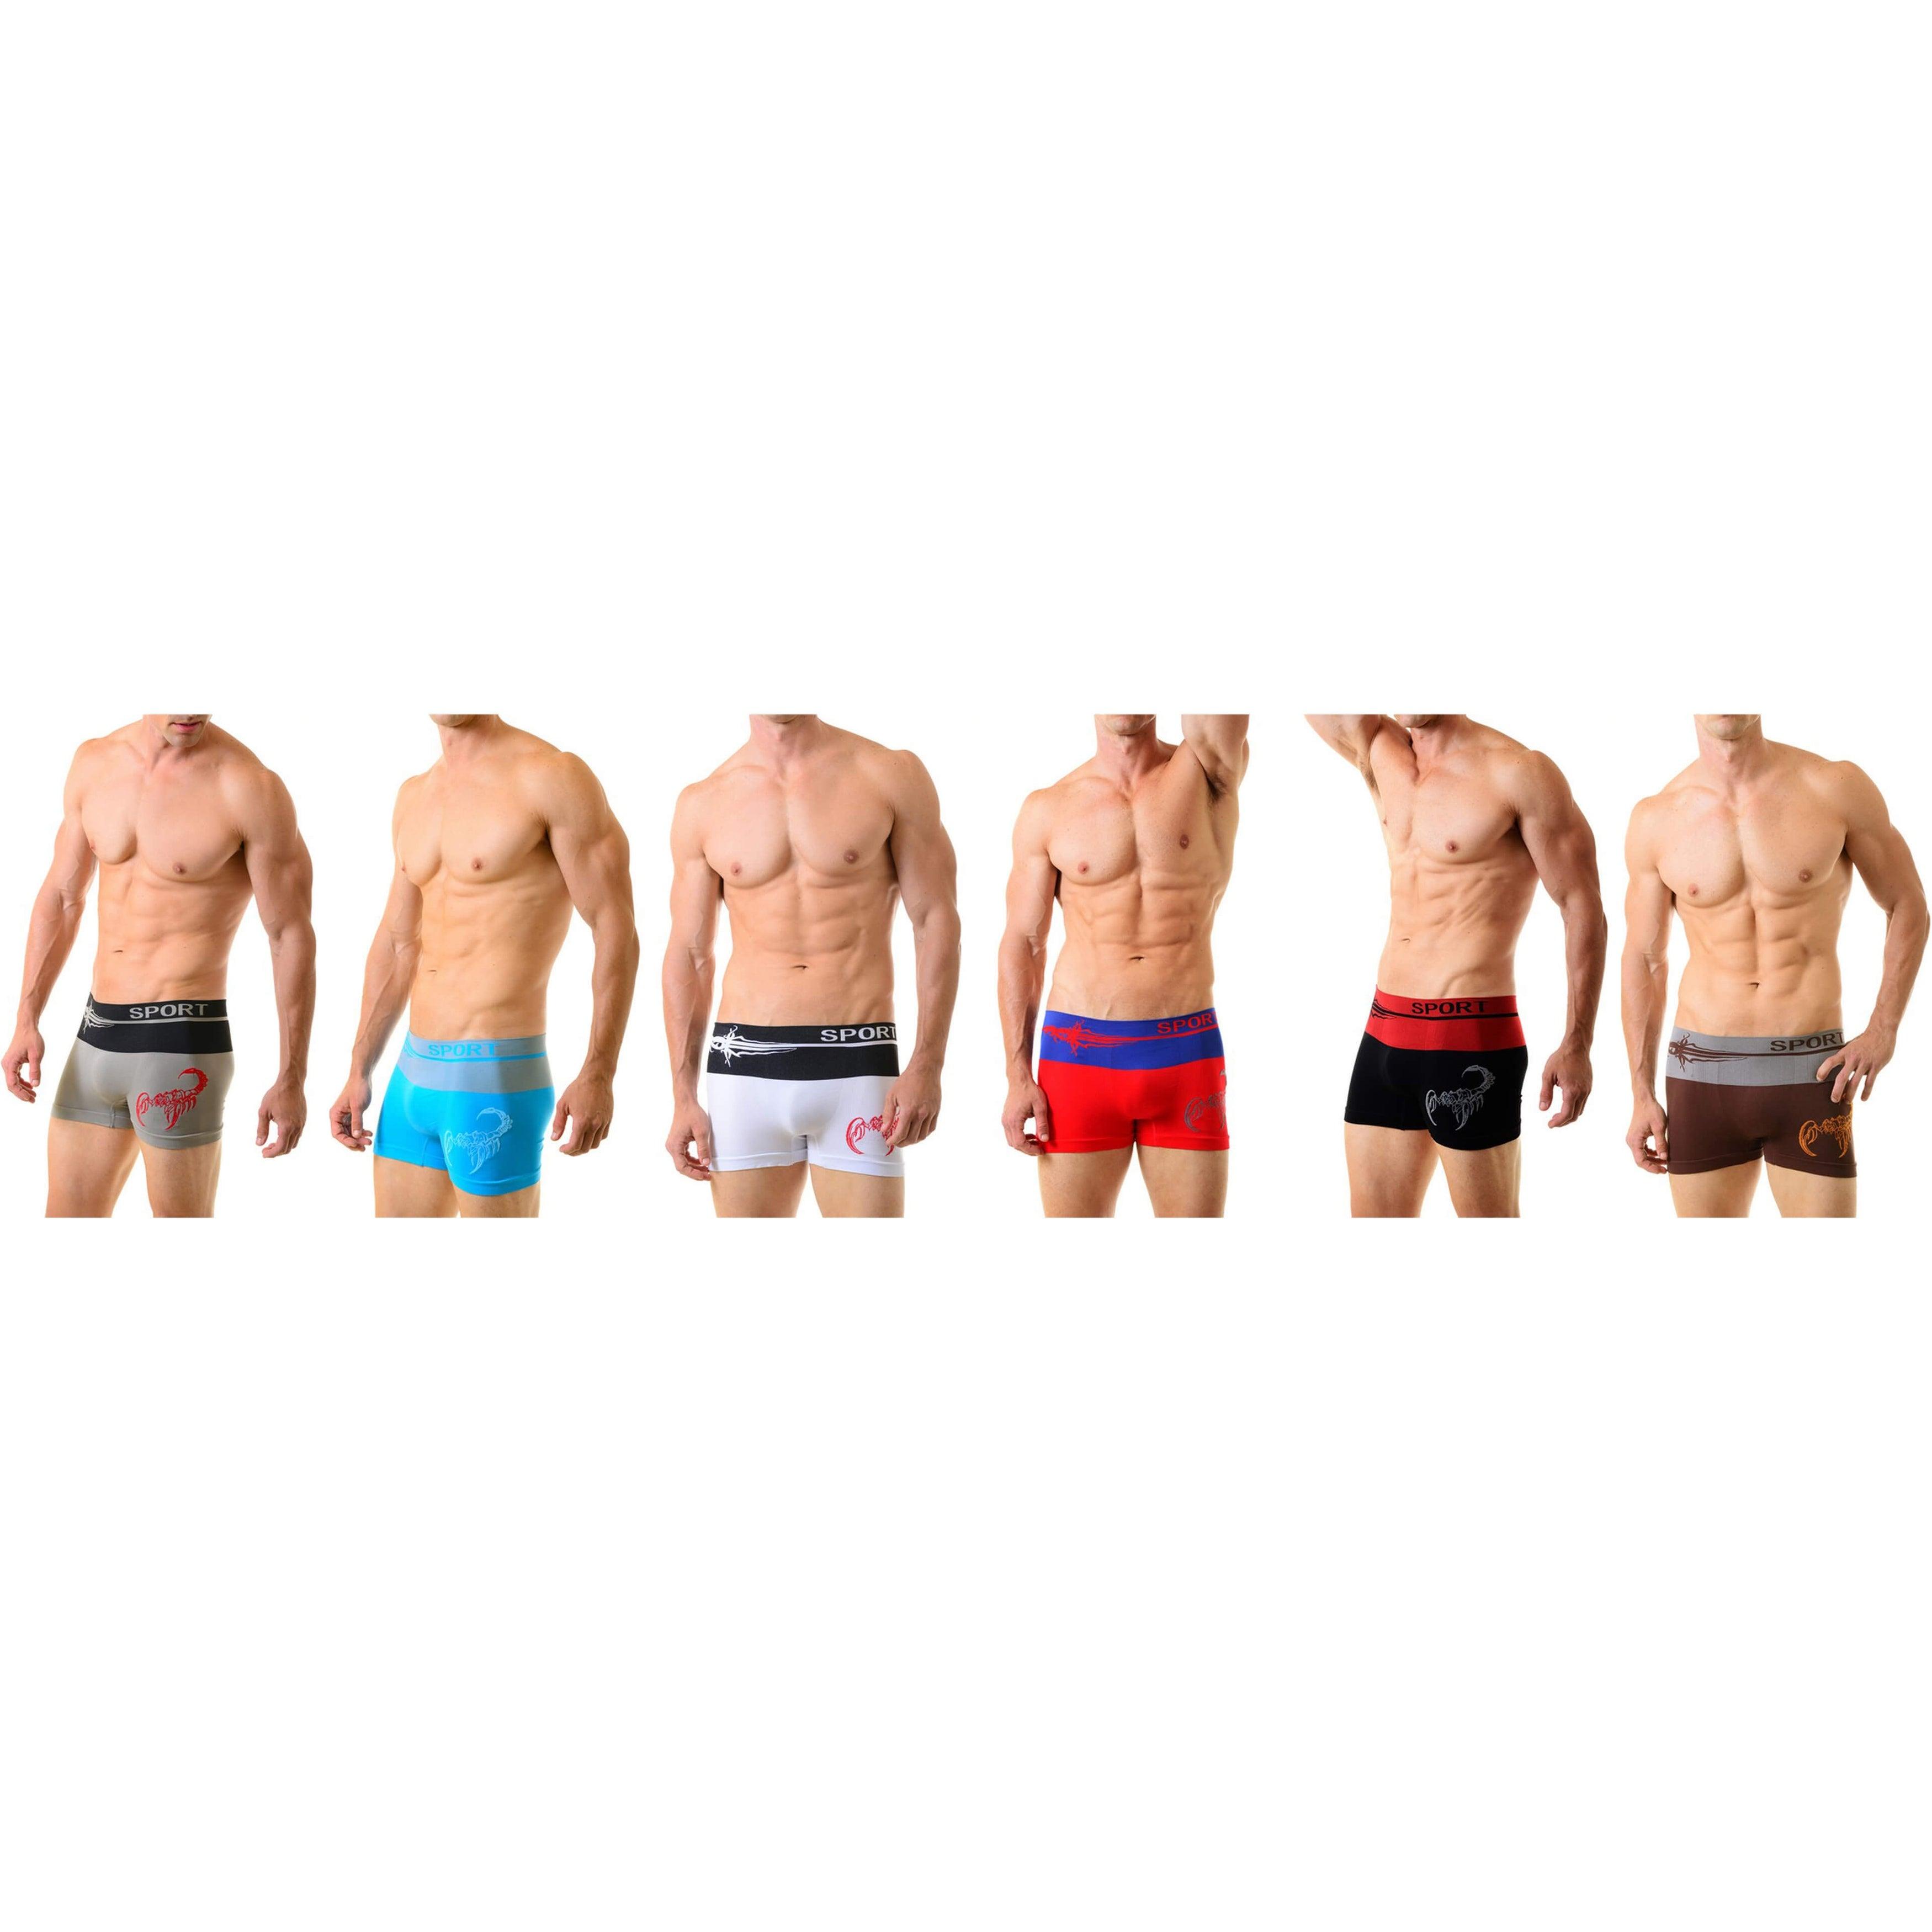 YELETE Seamless Thong Underwear